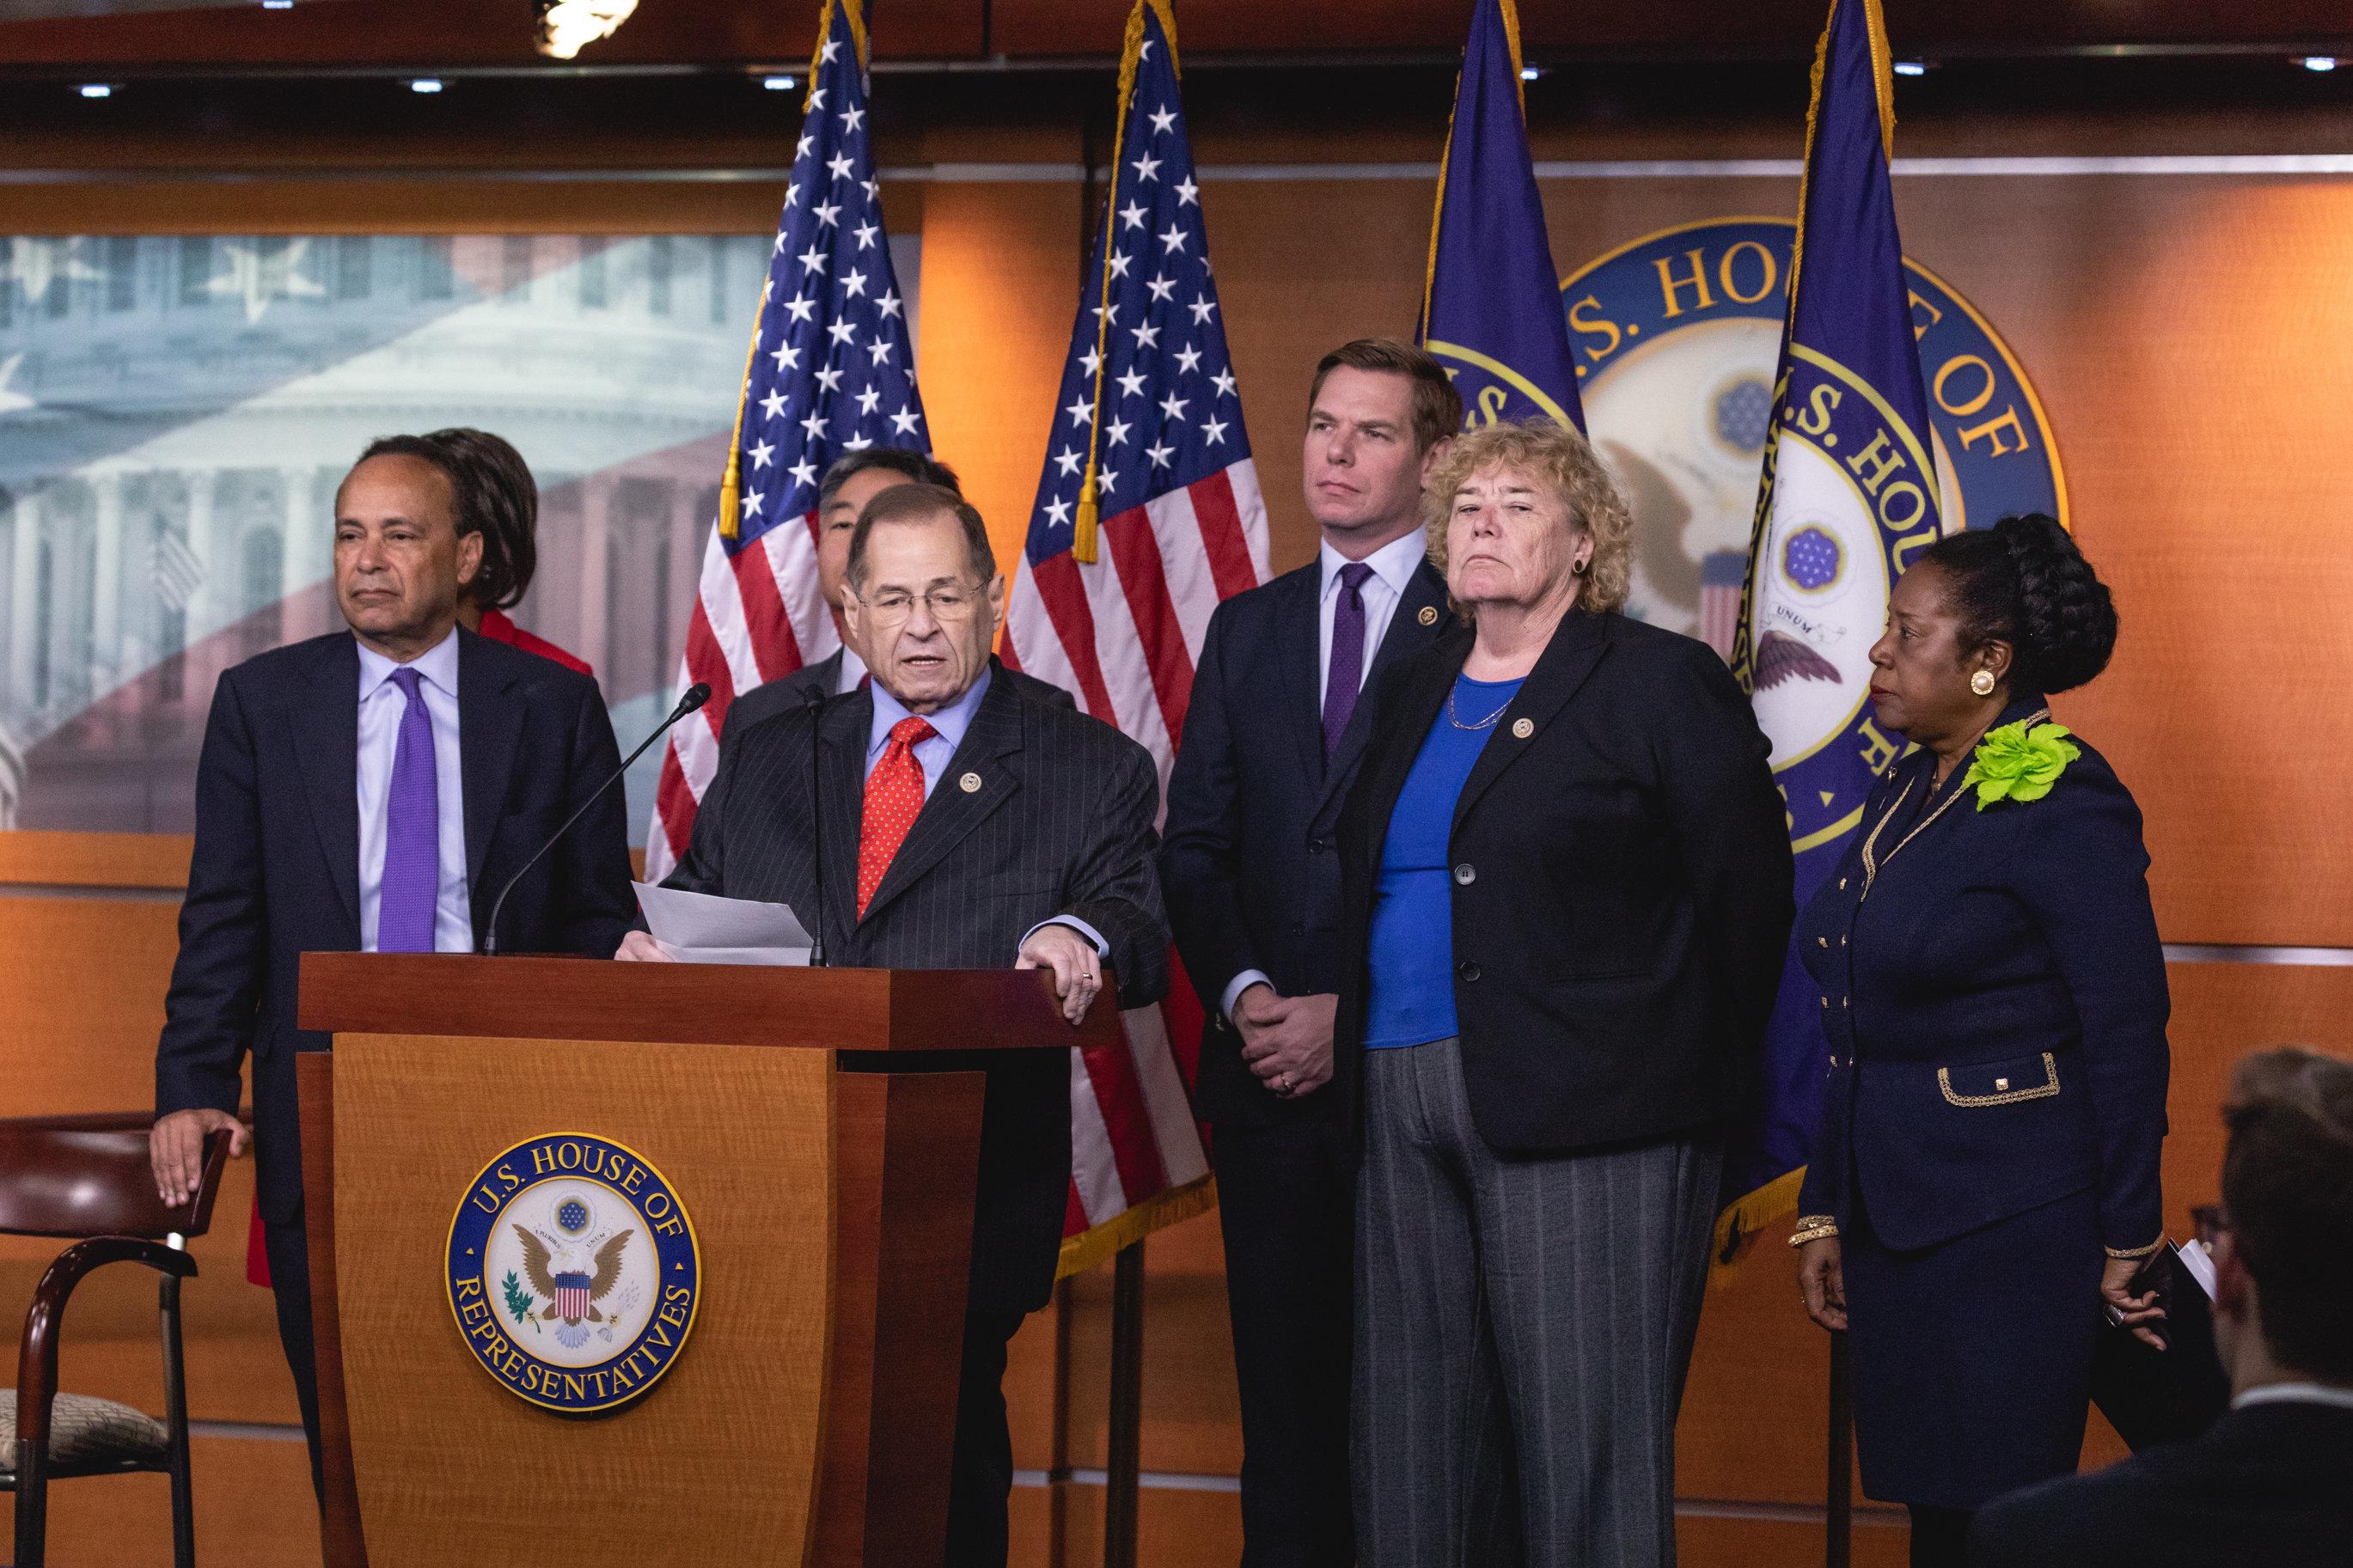 House Judiciary Committee Democrats want to investigate Supreme Court nominee Brett Kavanaugh.